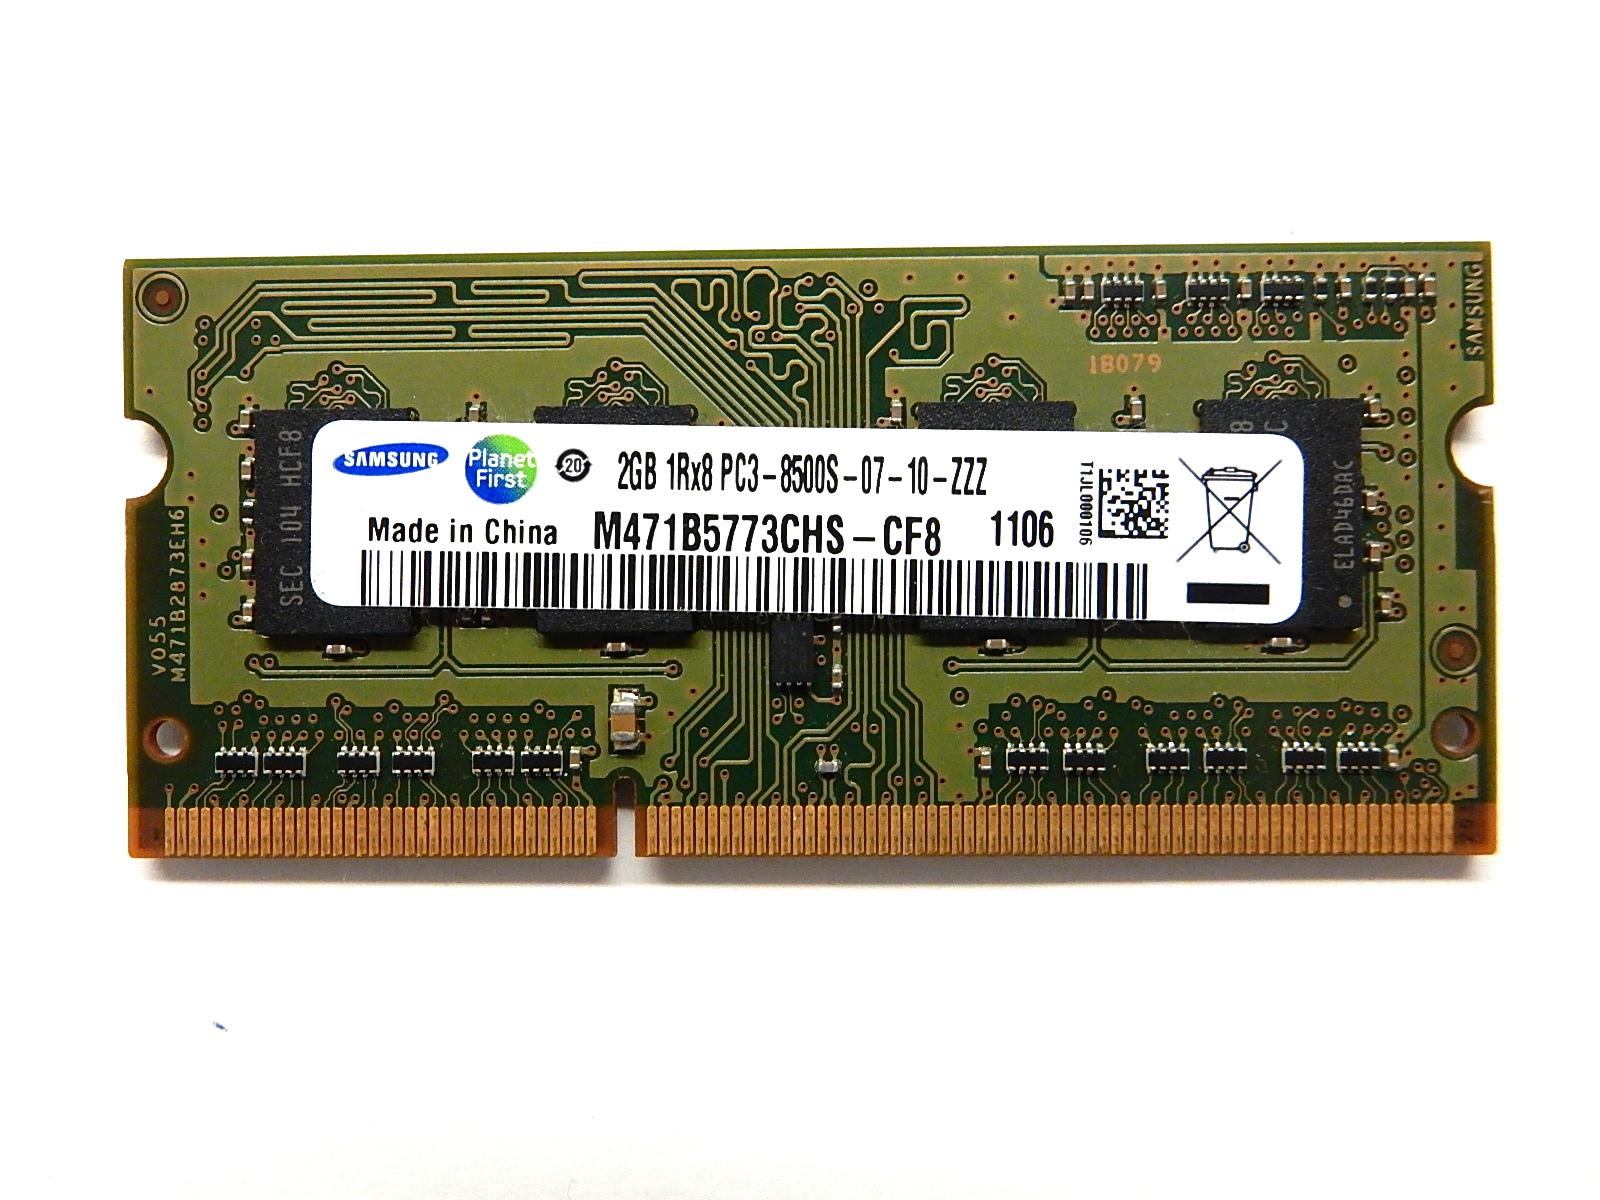 Samsung 2GB M471B5773CHS-СF8 2GB 1Rx8 PC3-8500S-07-10-ZZZ